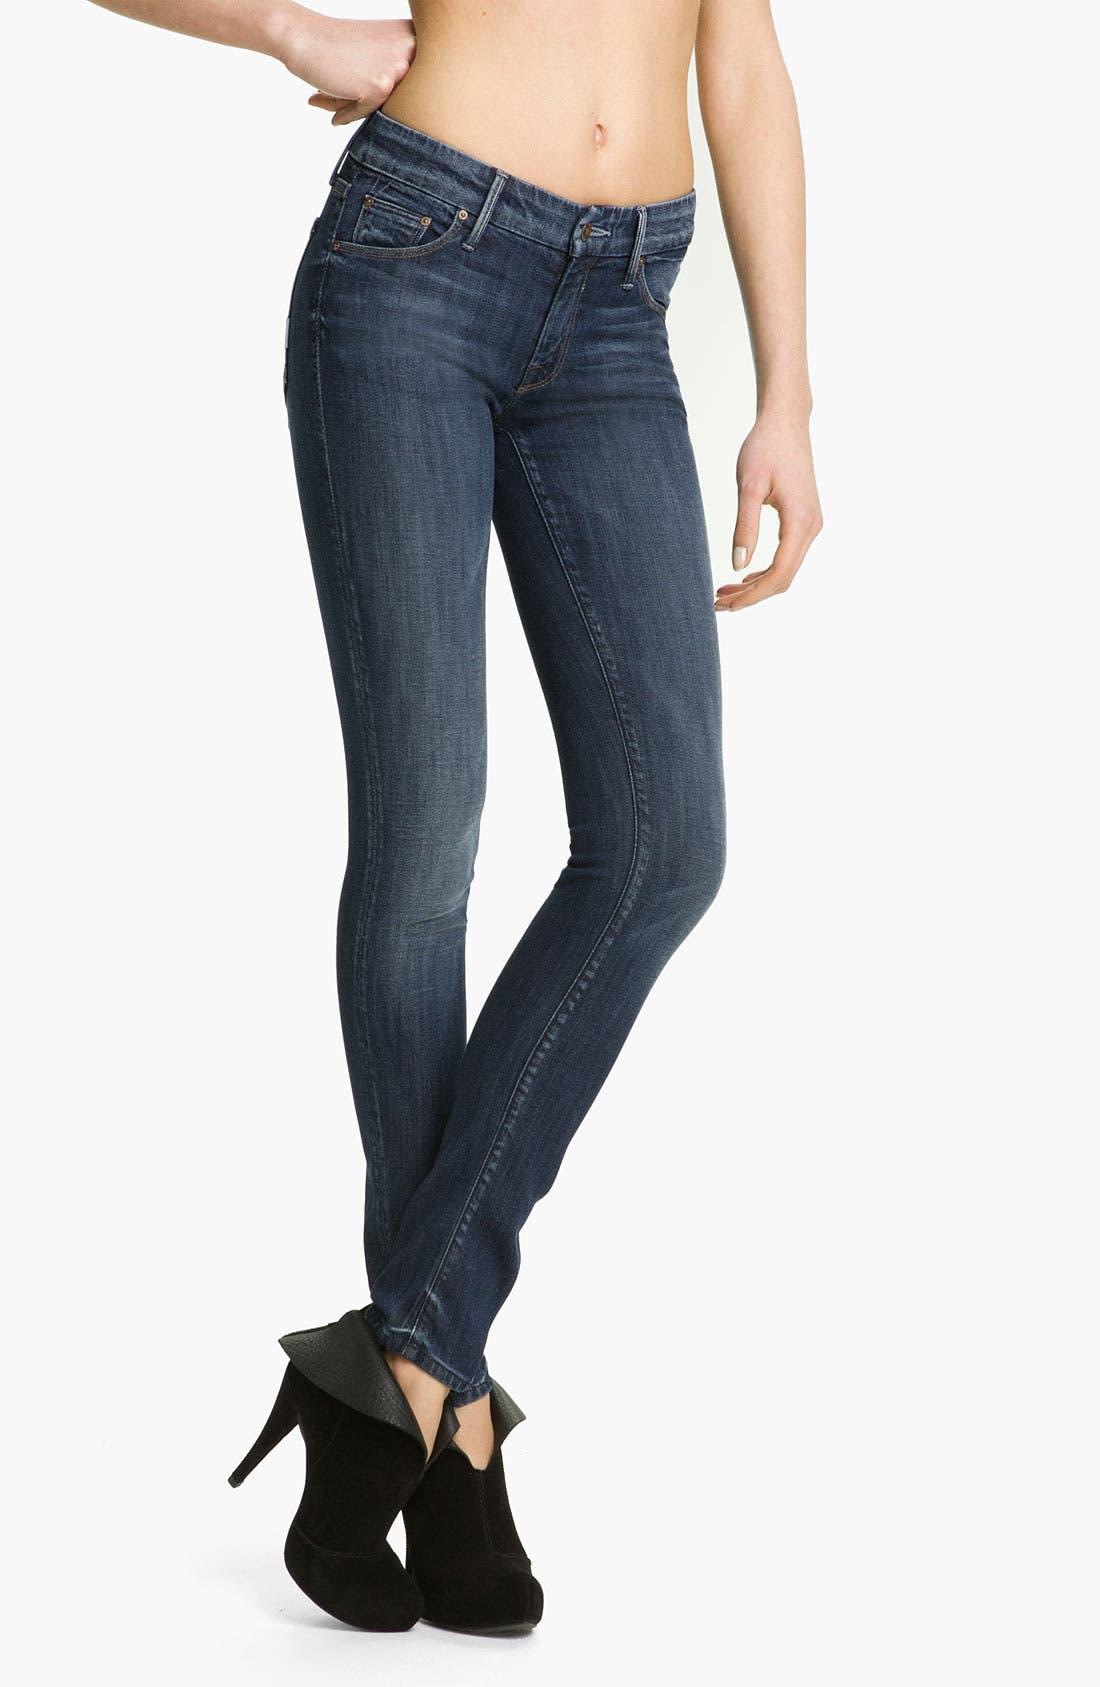 Alternate Image 1 Selected - MOTHER 'The Looker' Skinny Stretch Jeans (Deja Vu)